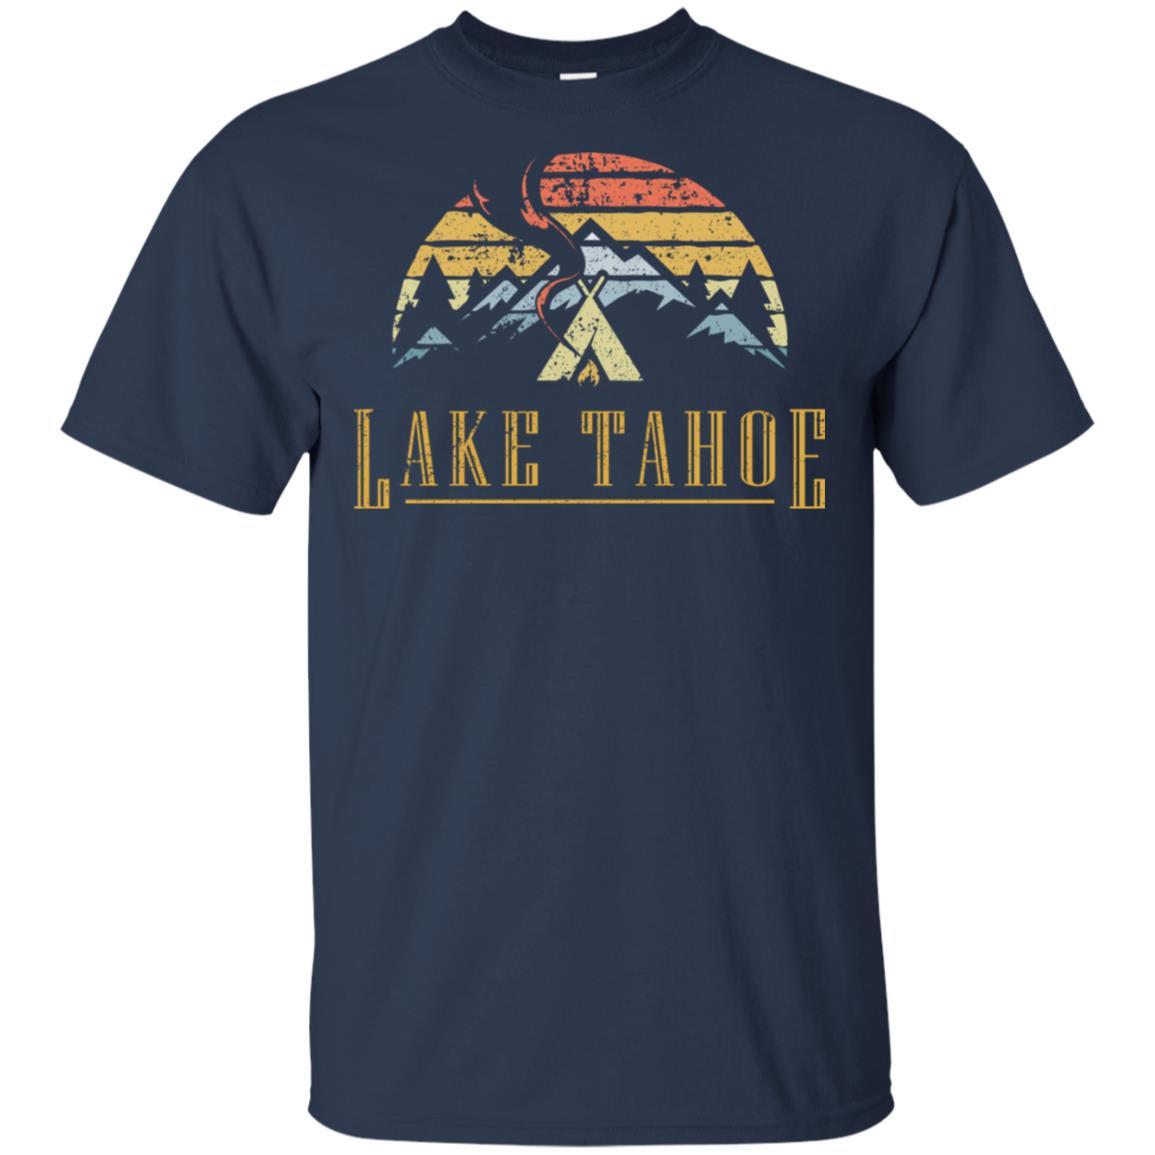 Vintage Lake Tahoe Campground Campfire Unisex Short Sleeve